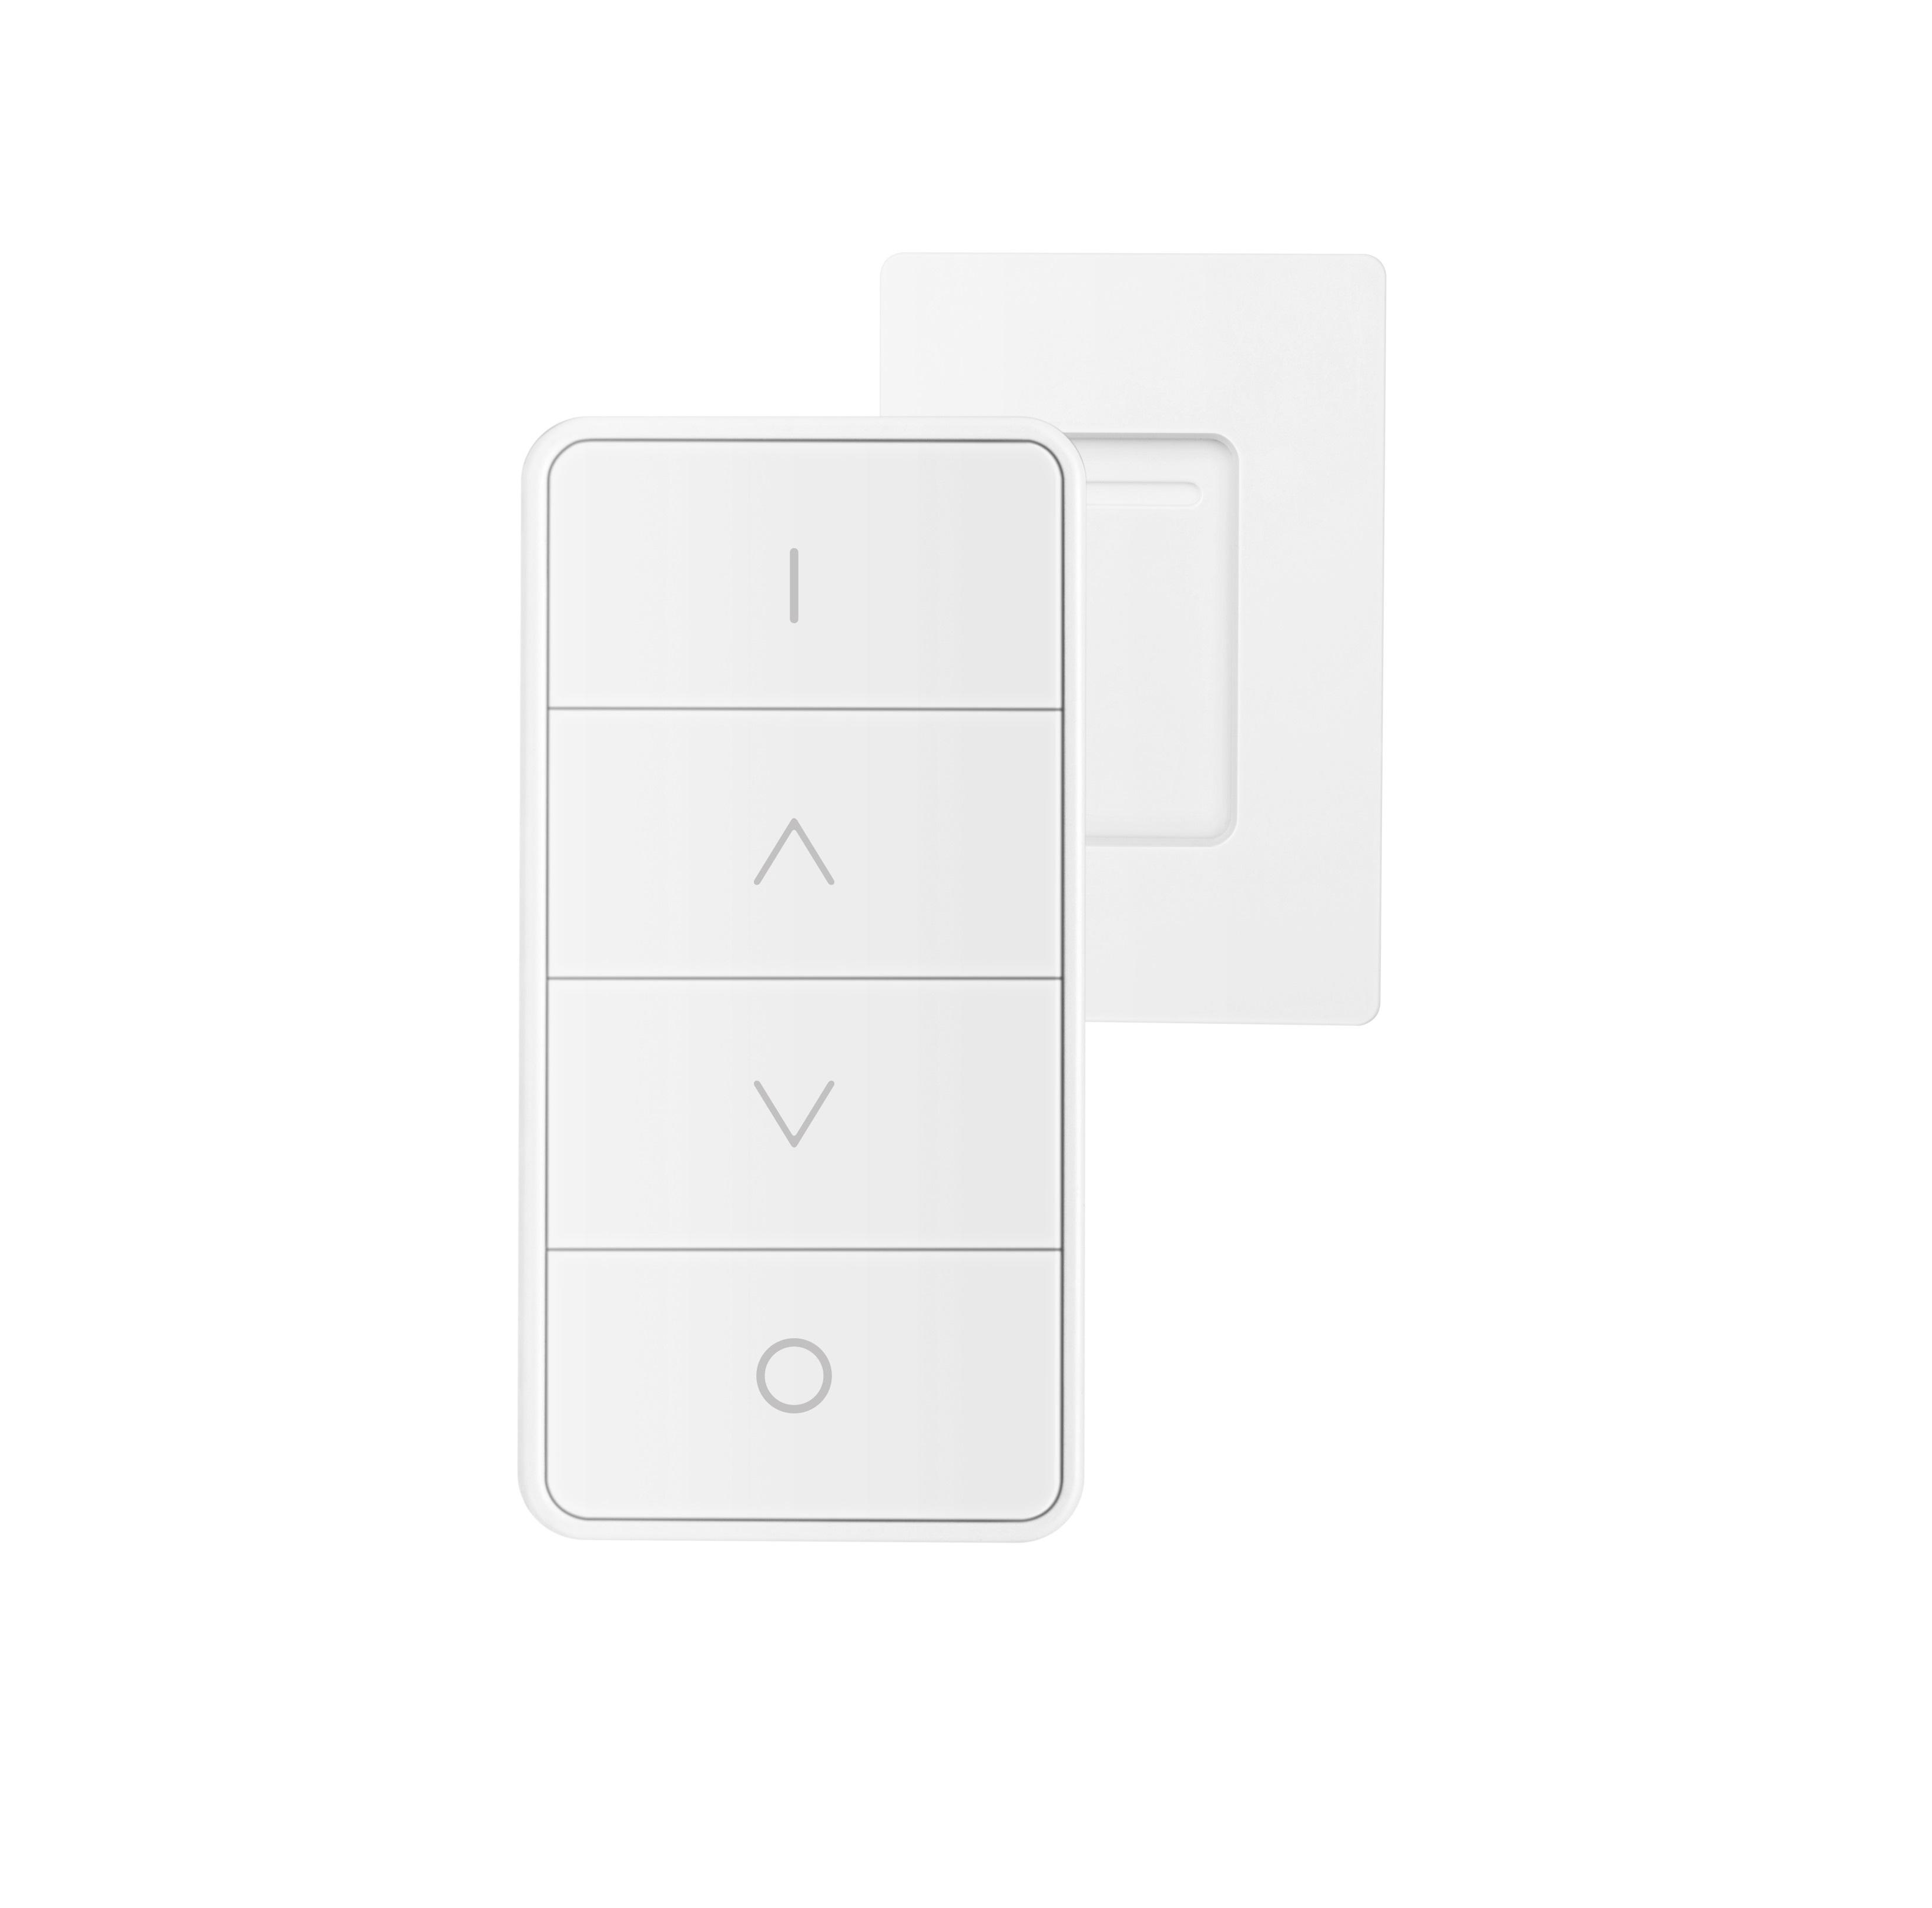 Zigbee Wireless Dimming Switch Remote